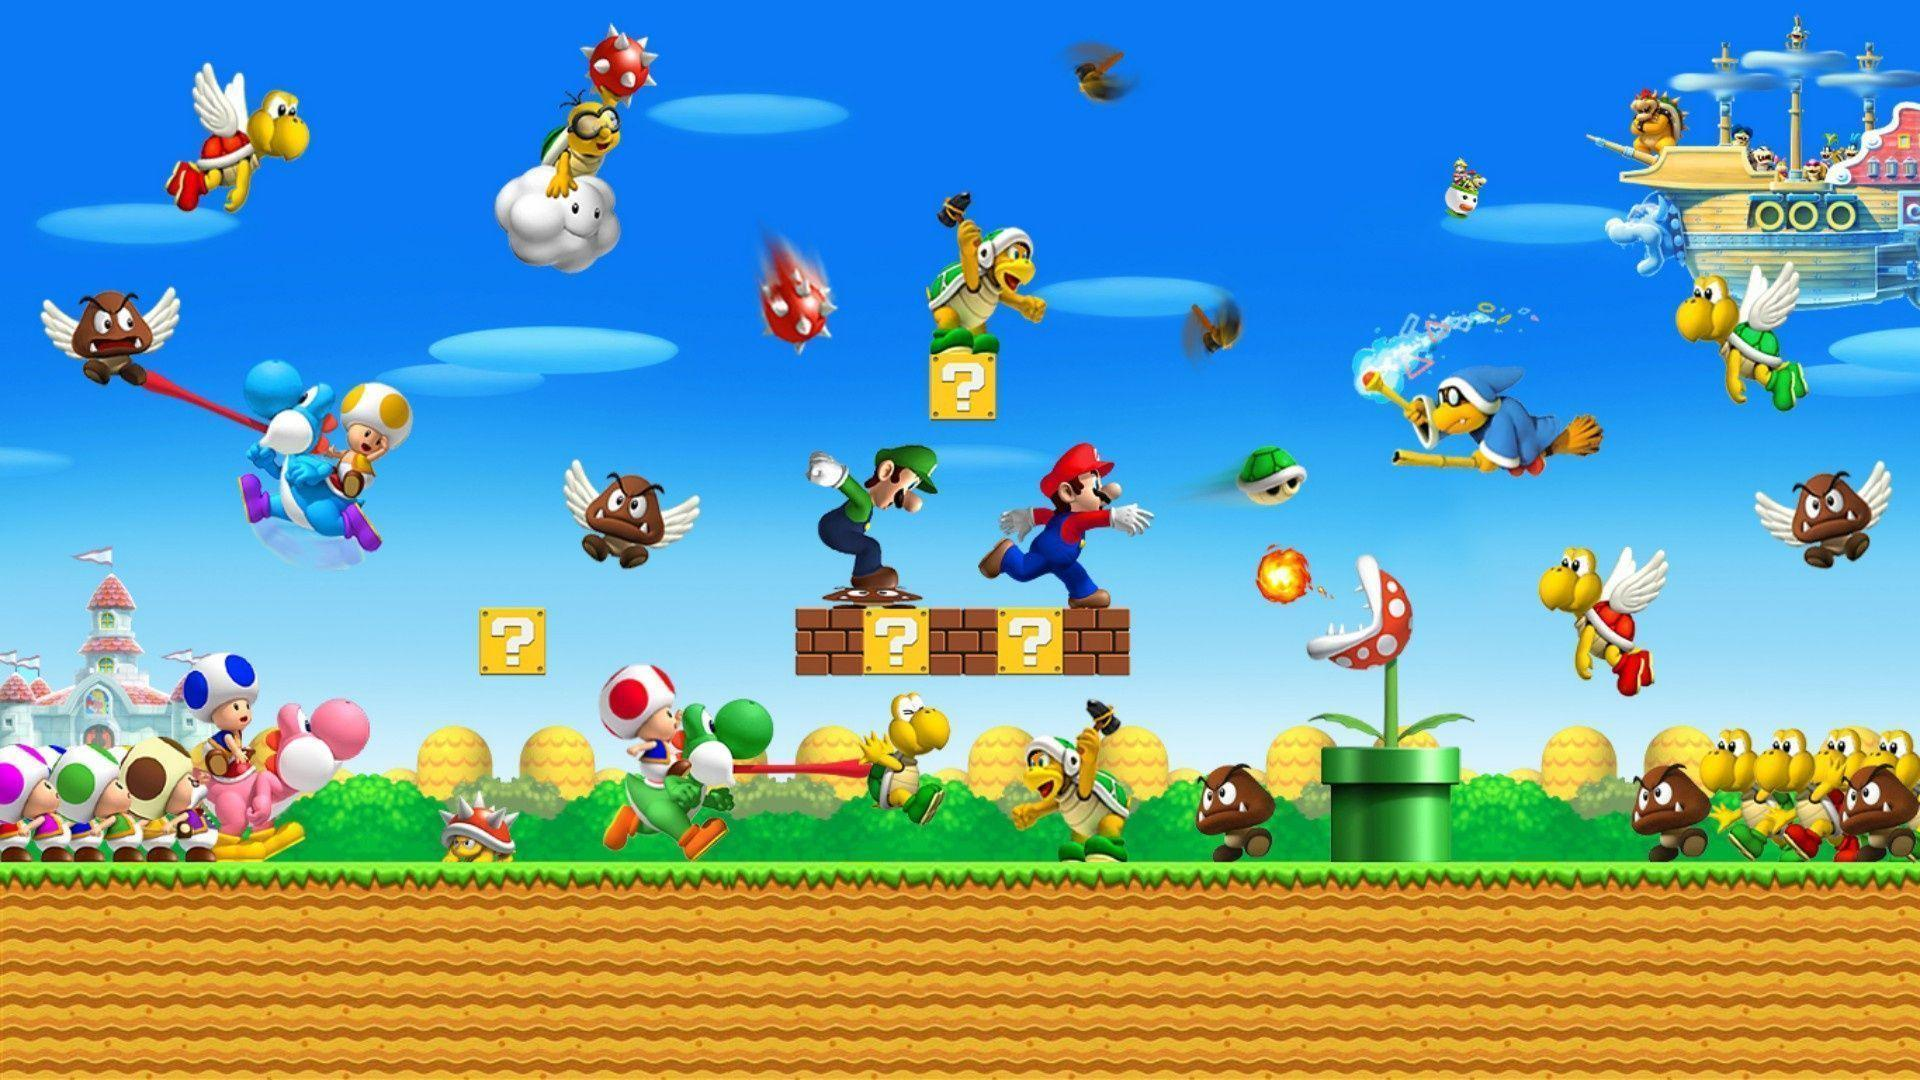 New Super Mario Bros 2 wallpaper - 1175789